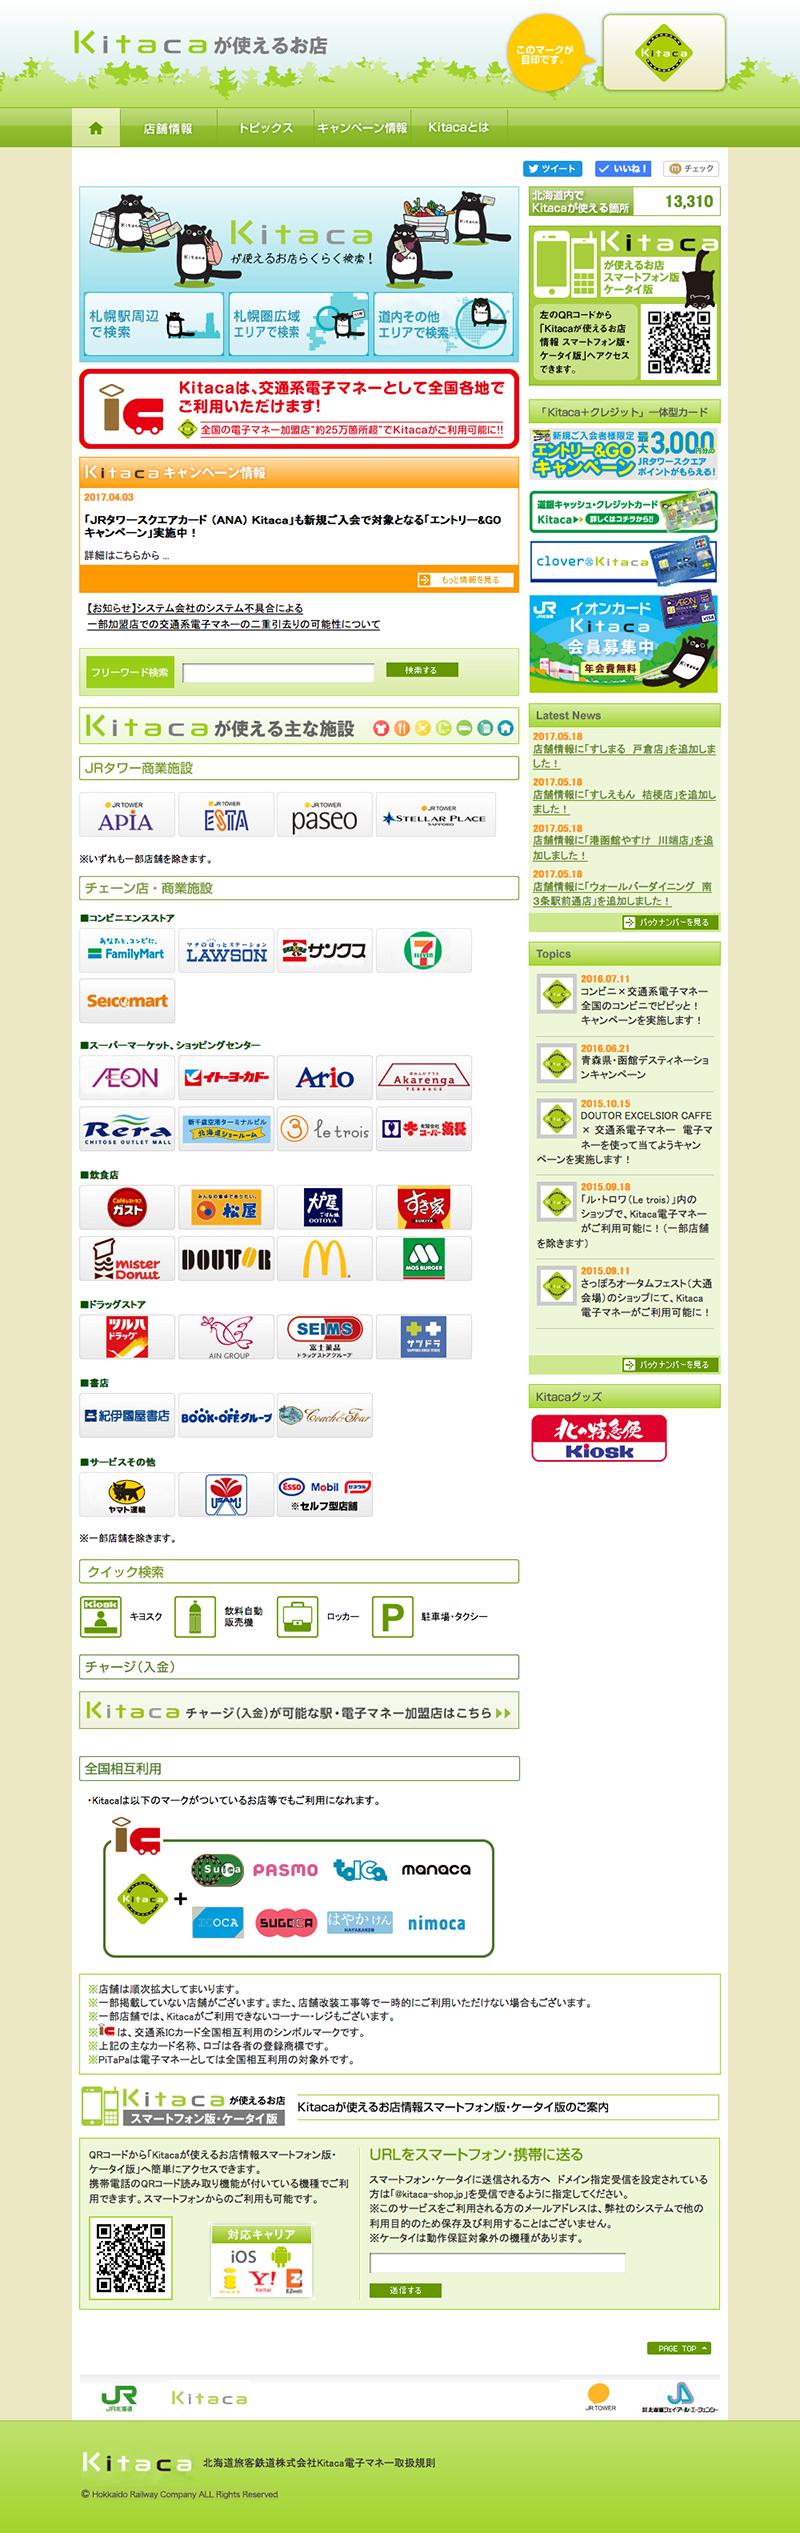 www.kitaca-shop.jp_